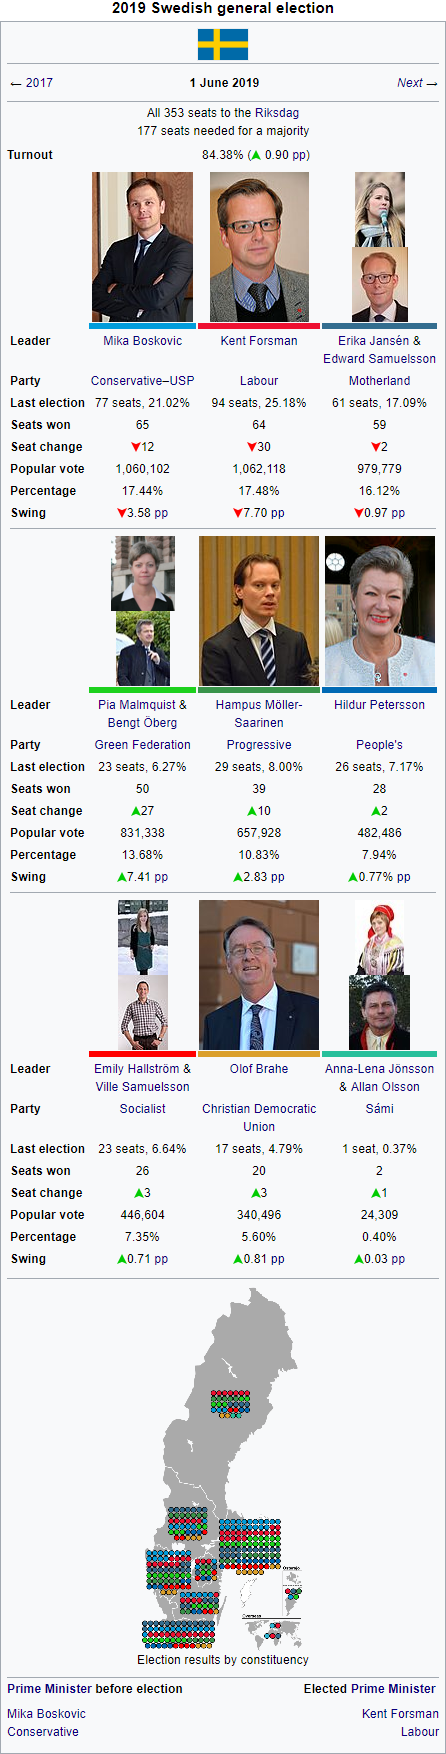 2019 Swedish election.png